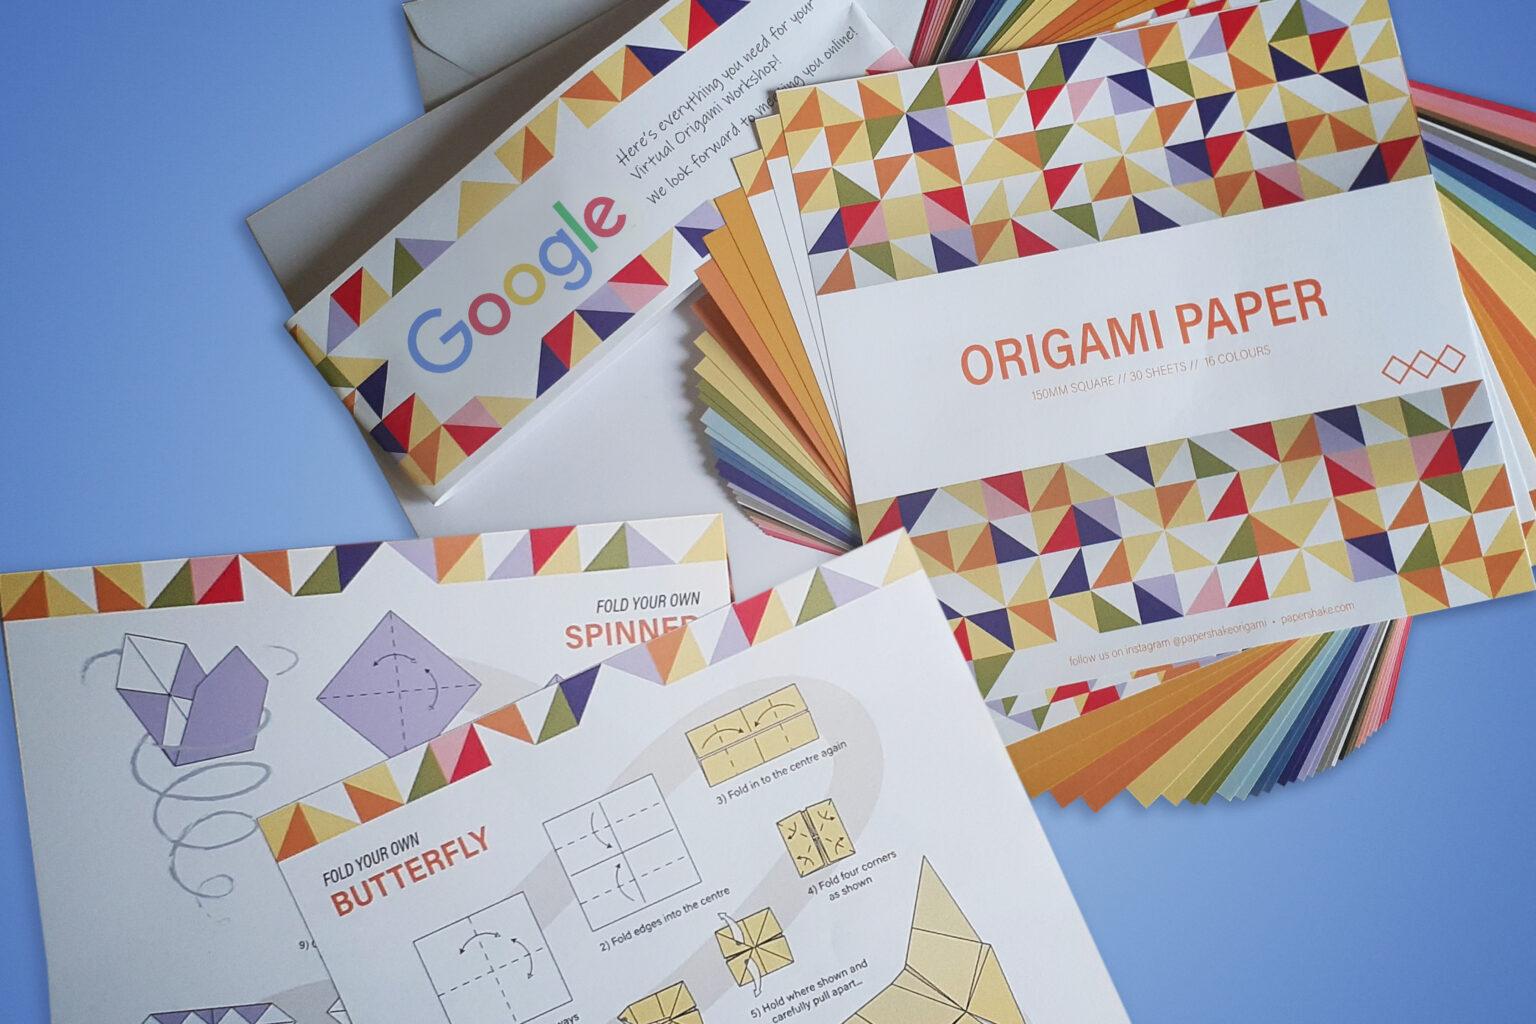 201 Origami Packs (2)s